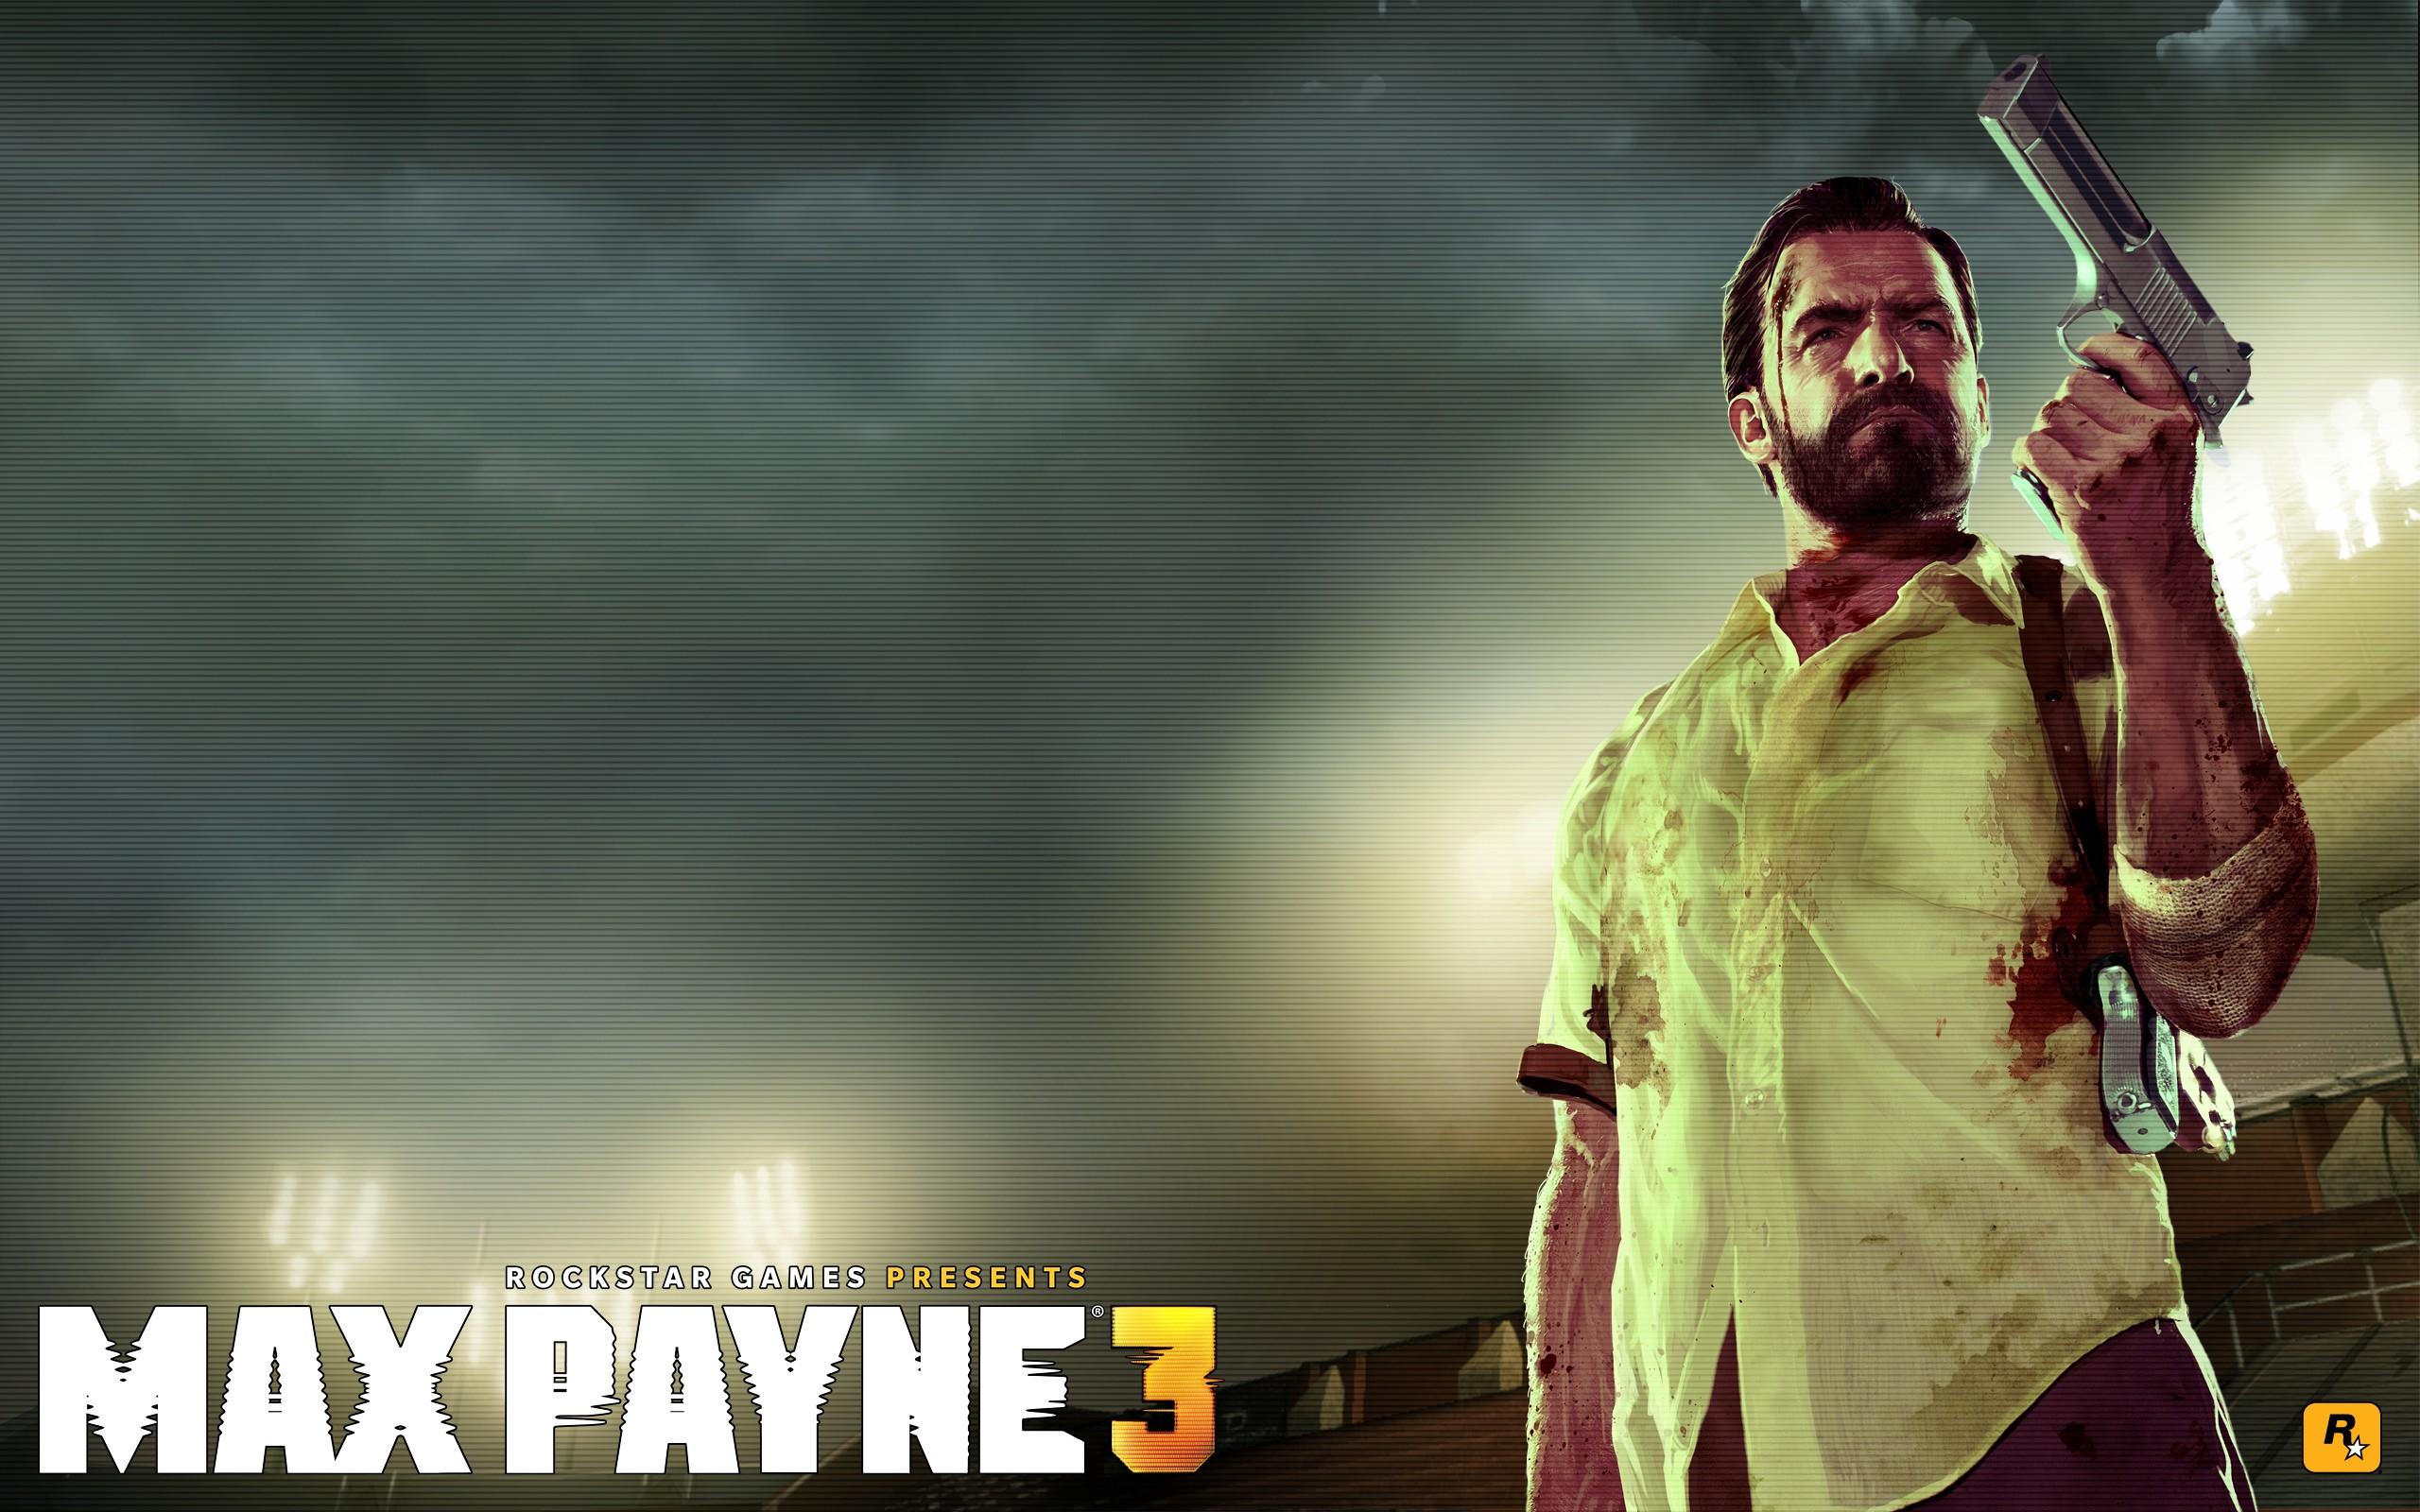 Max Payne 3 Wallpaper 4 Vektorgrafik   ForWallpapercom 2560x1600